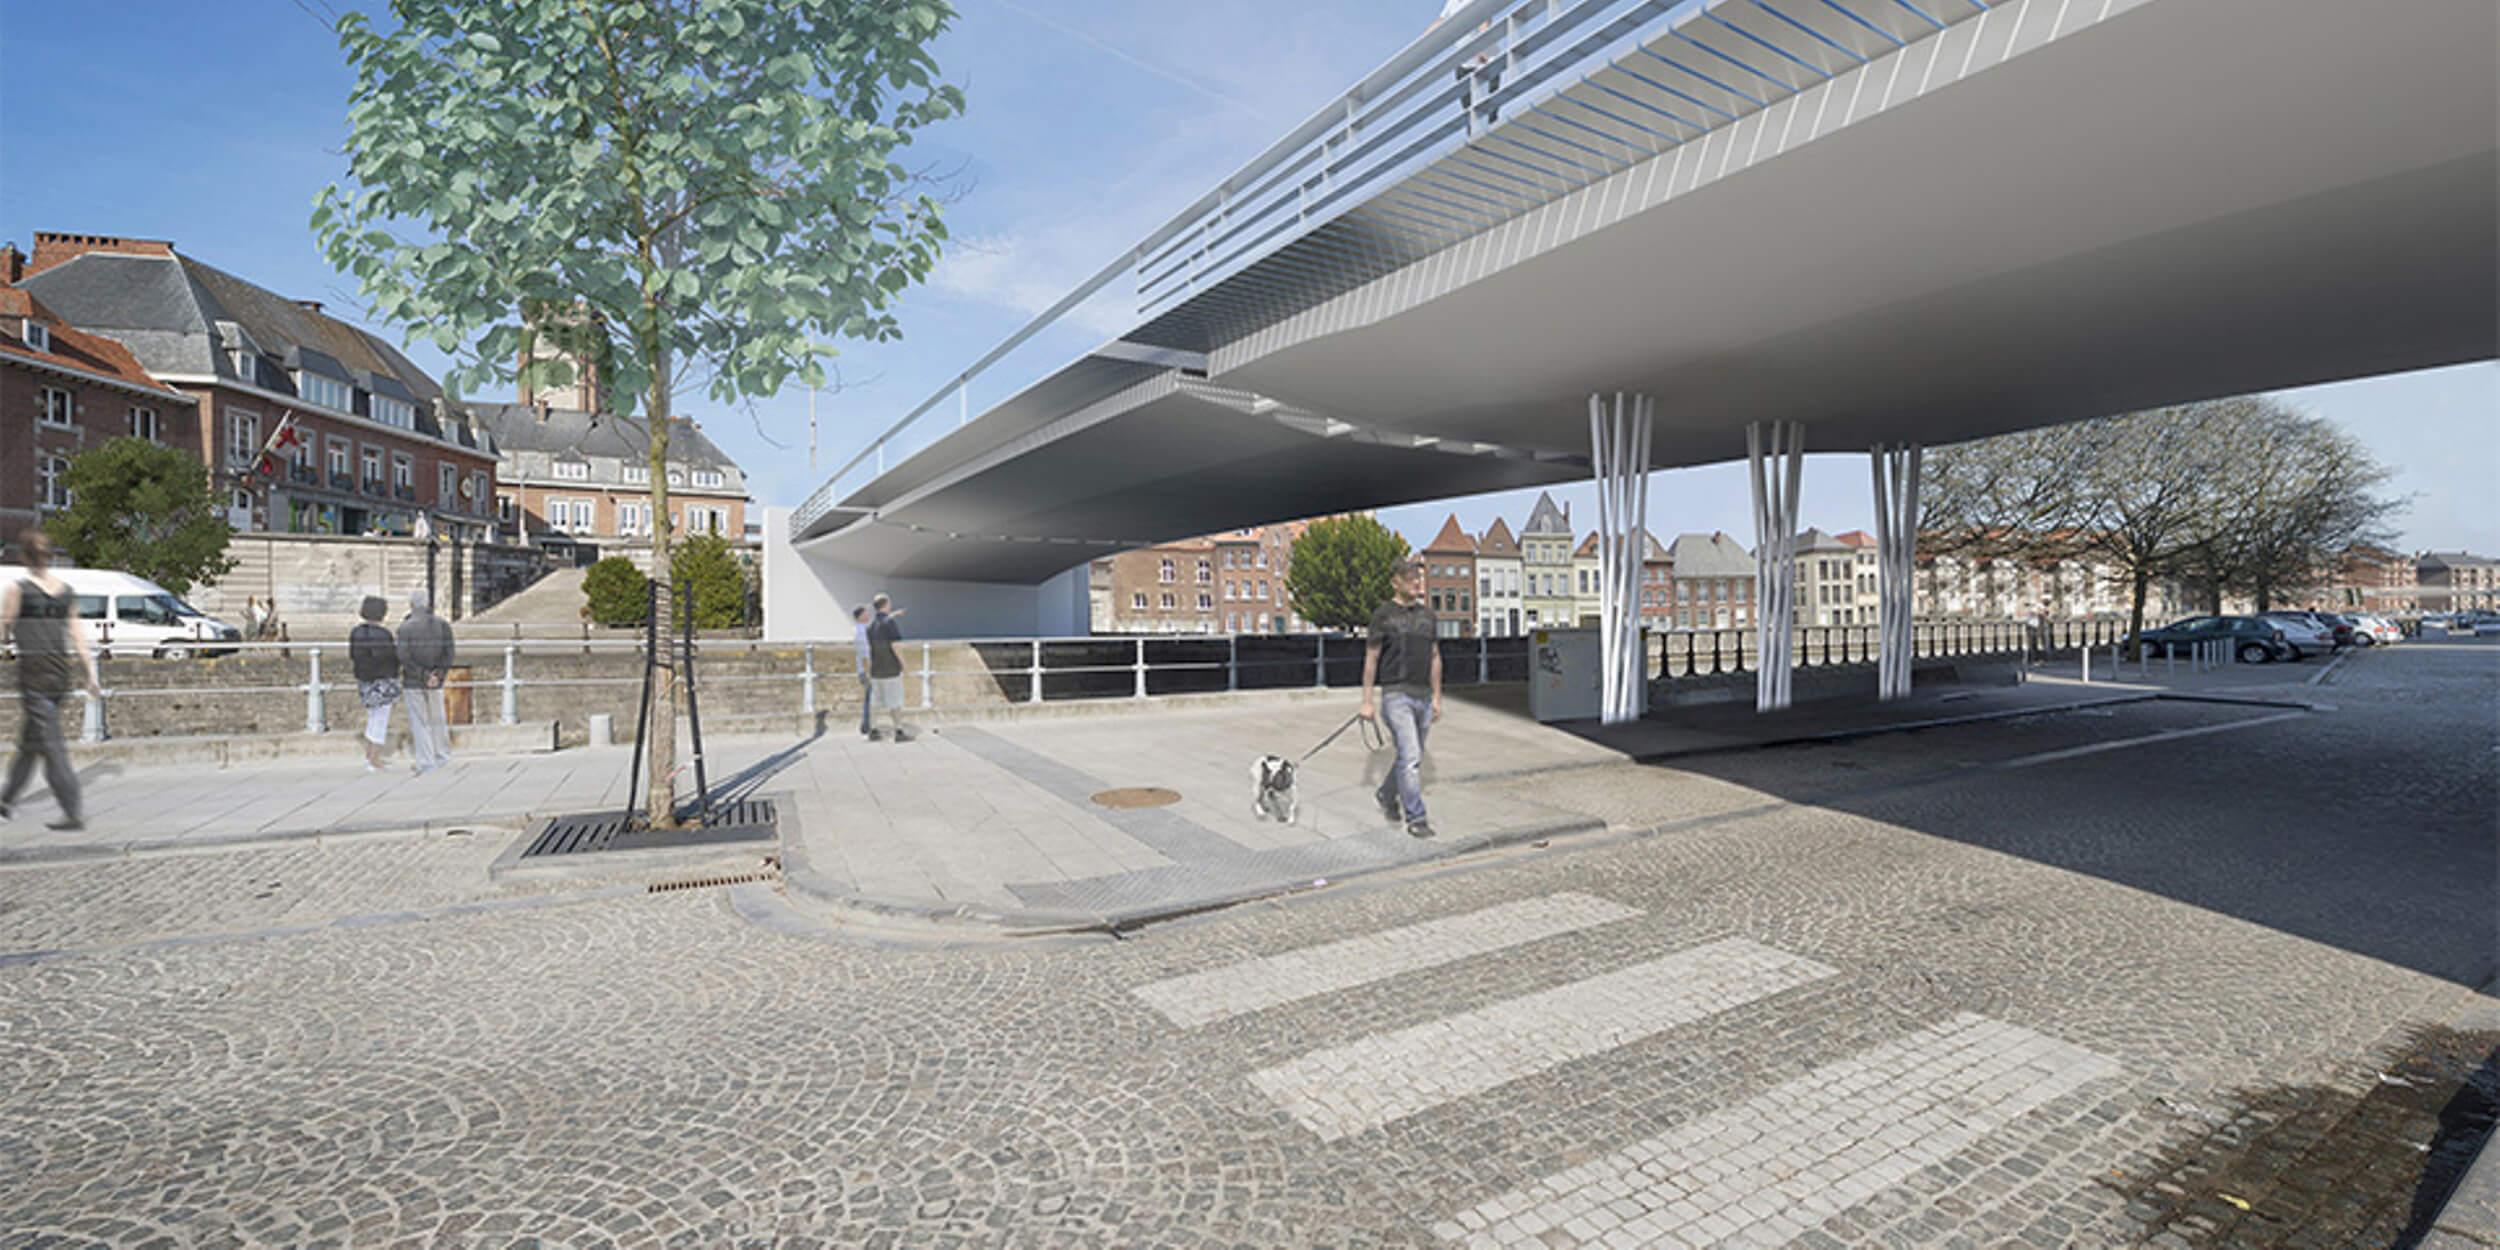 focus-archi-magazine-architecture-urbanisme-scaldist-tournai-02.jpg